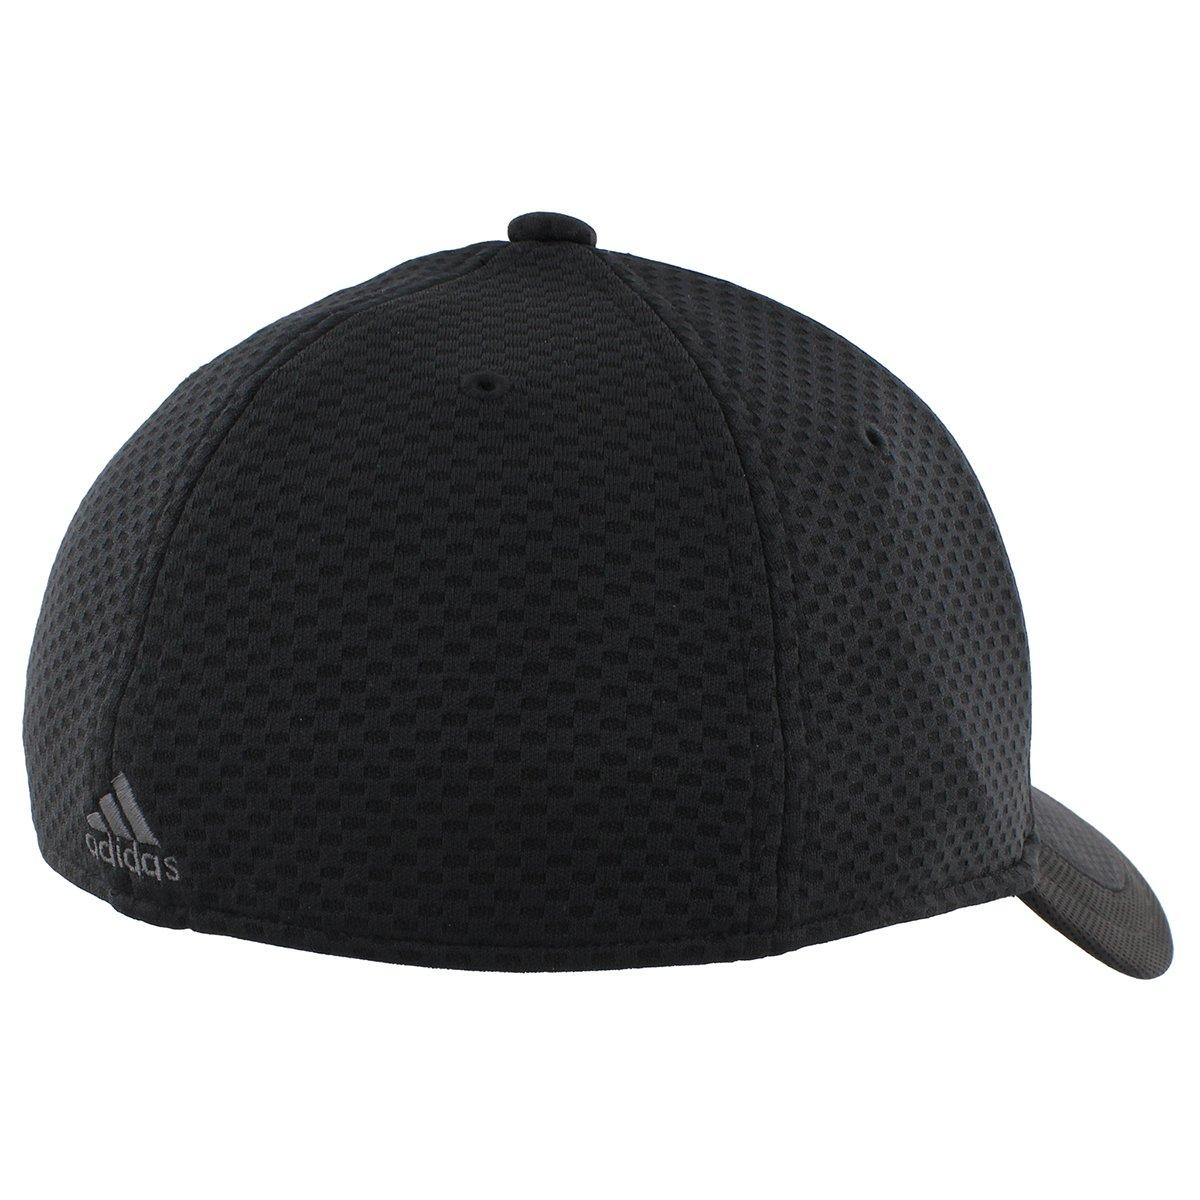 ef51af1d0ad59 adidas Mens Amplifier Stretch Fit Structured Cap